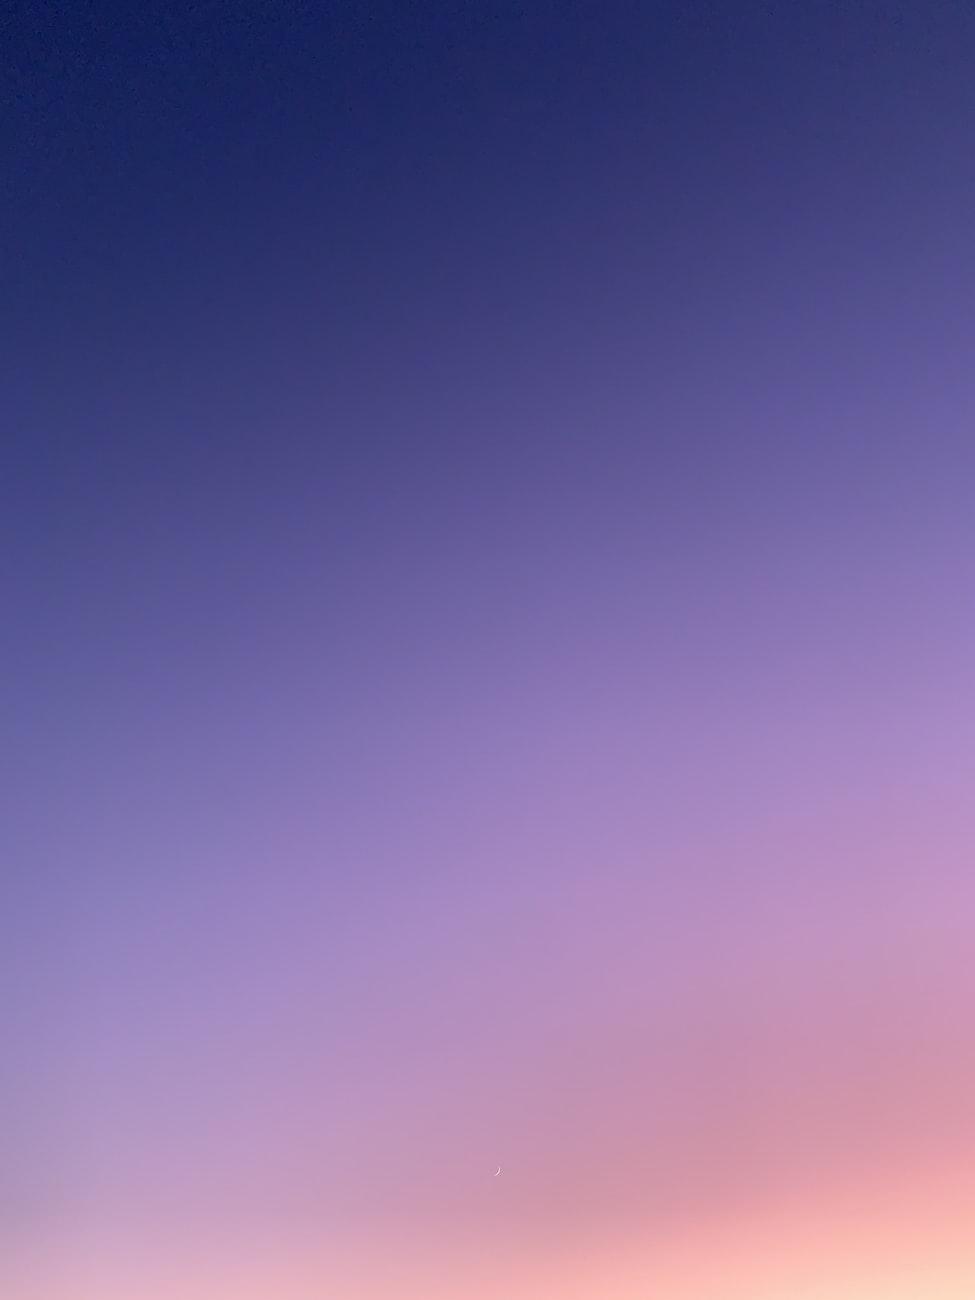 sunset linkedin background